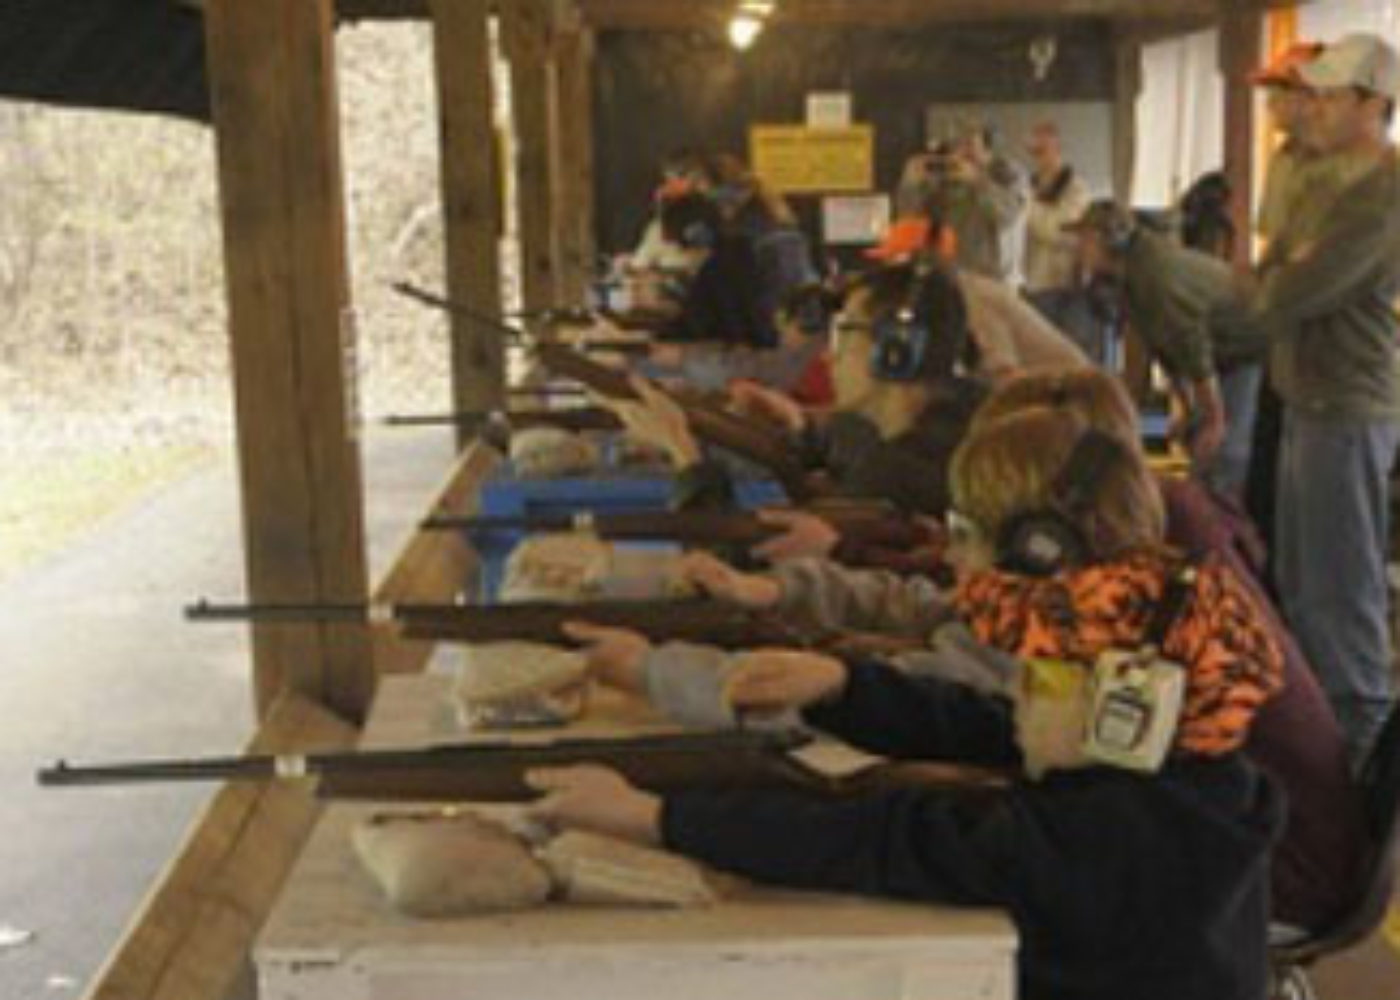 Basic Firearm Safety Spring 2019